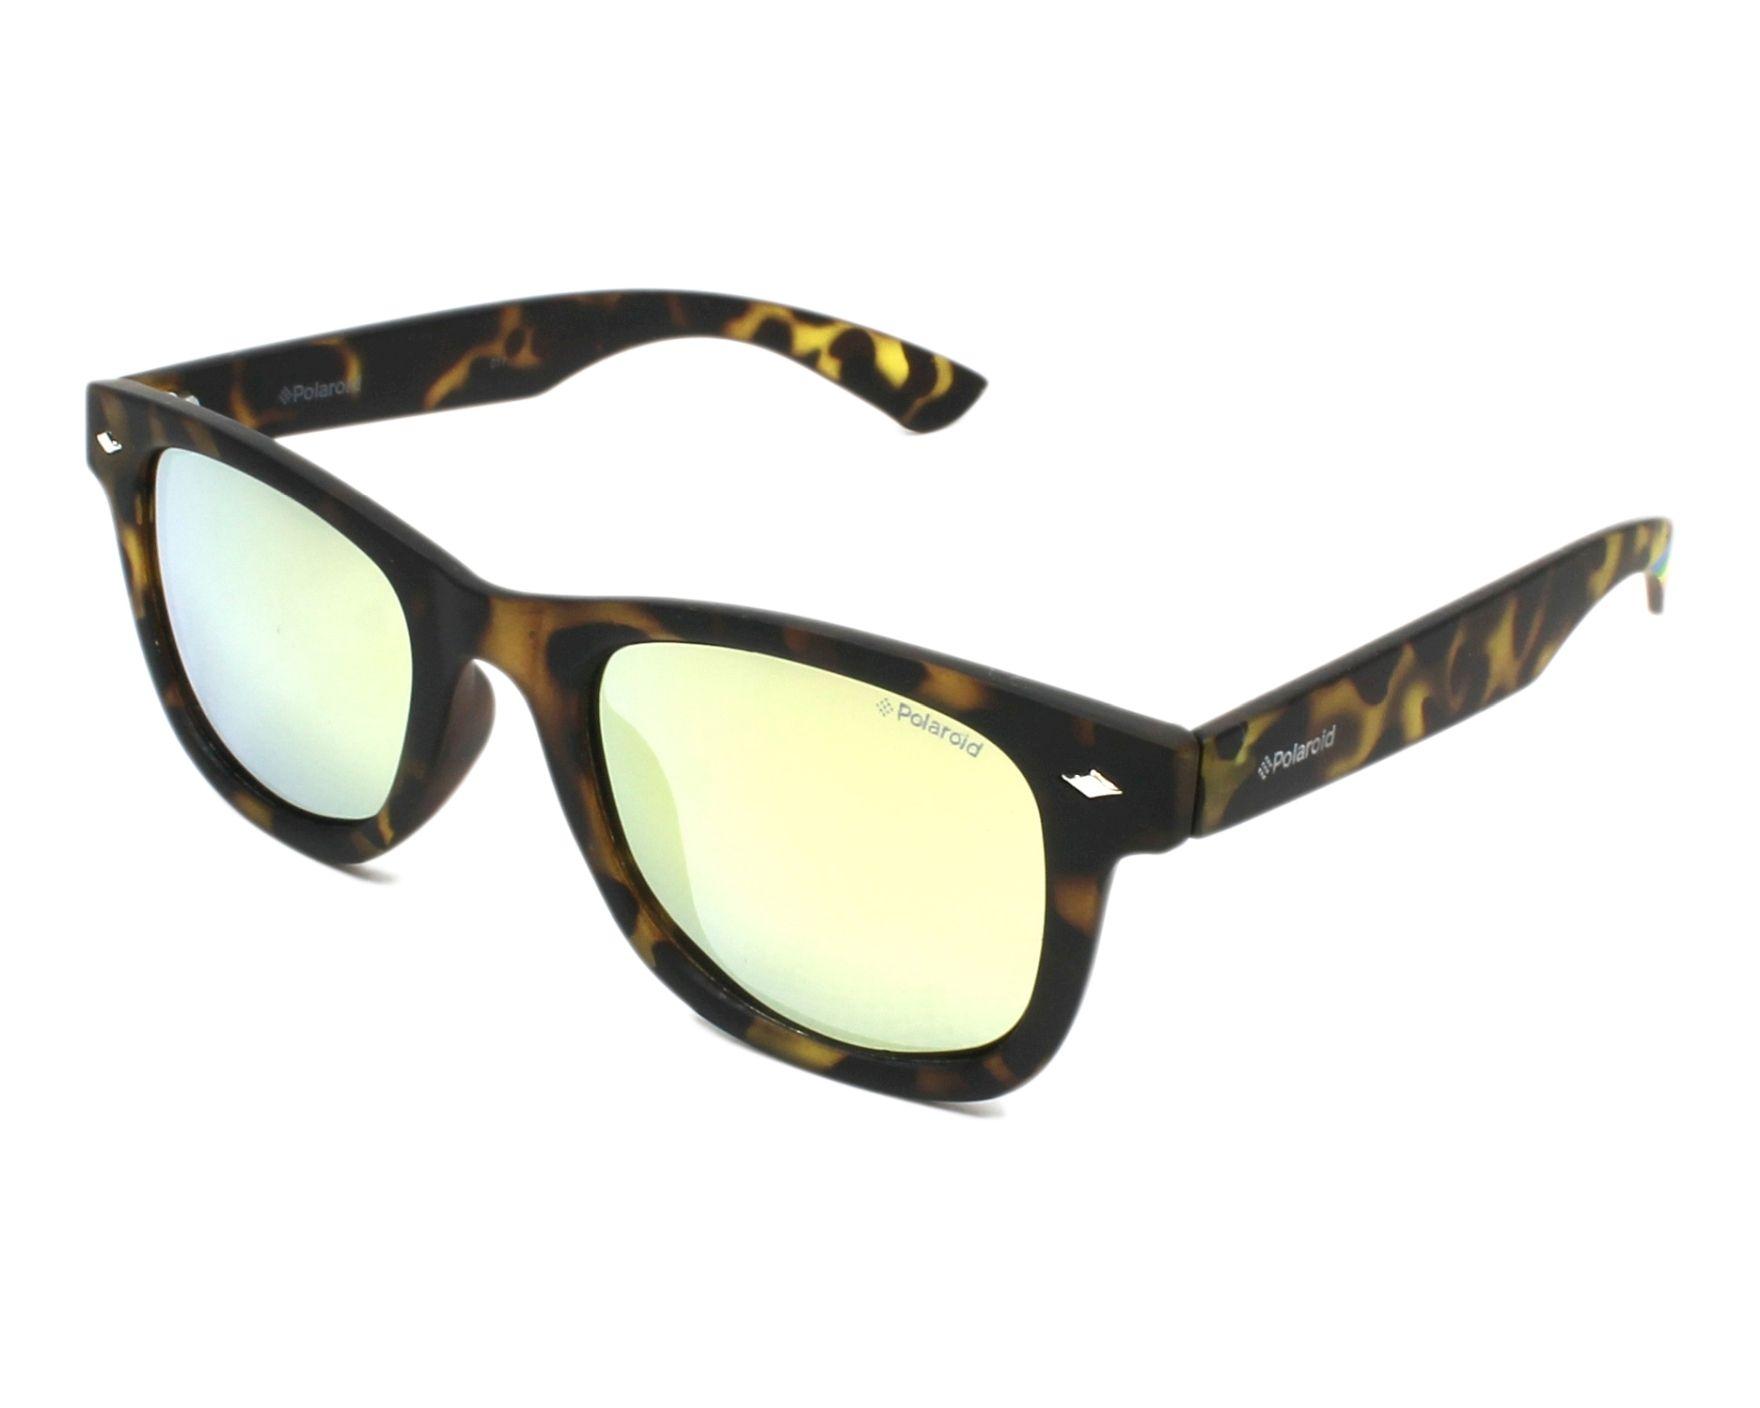 Polaroid Kindersonnenbrille PLD 8009/N-Schwarz vBZFDB4wJ